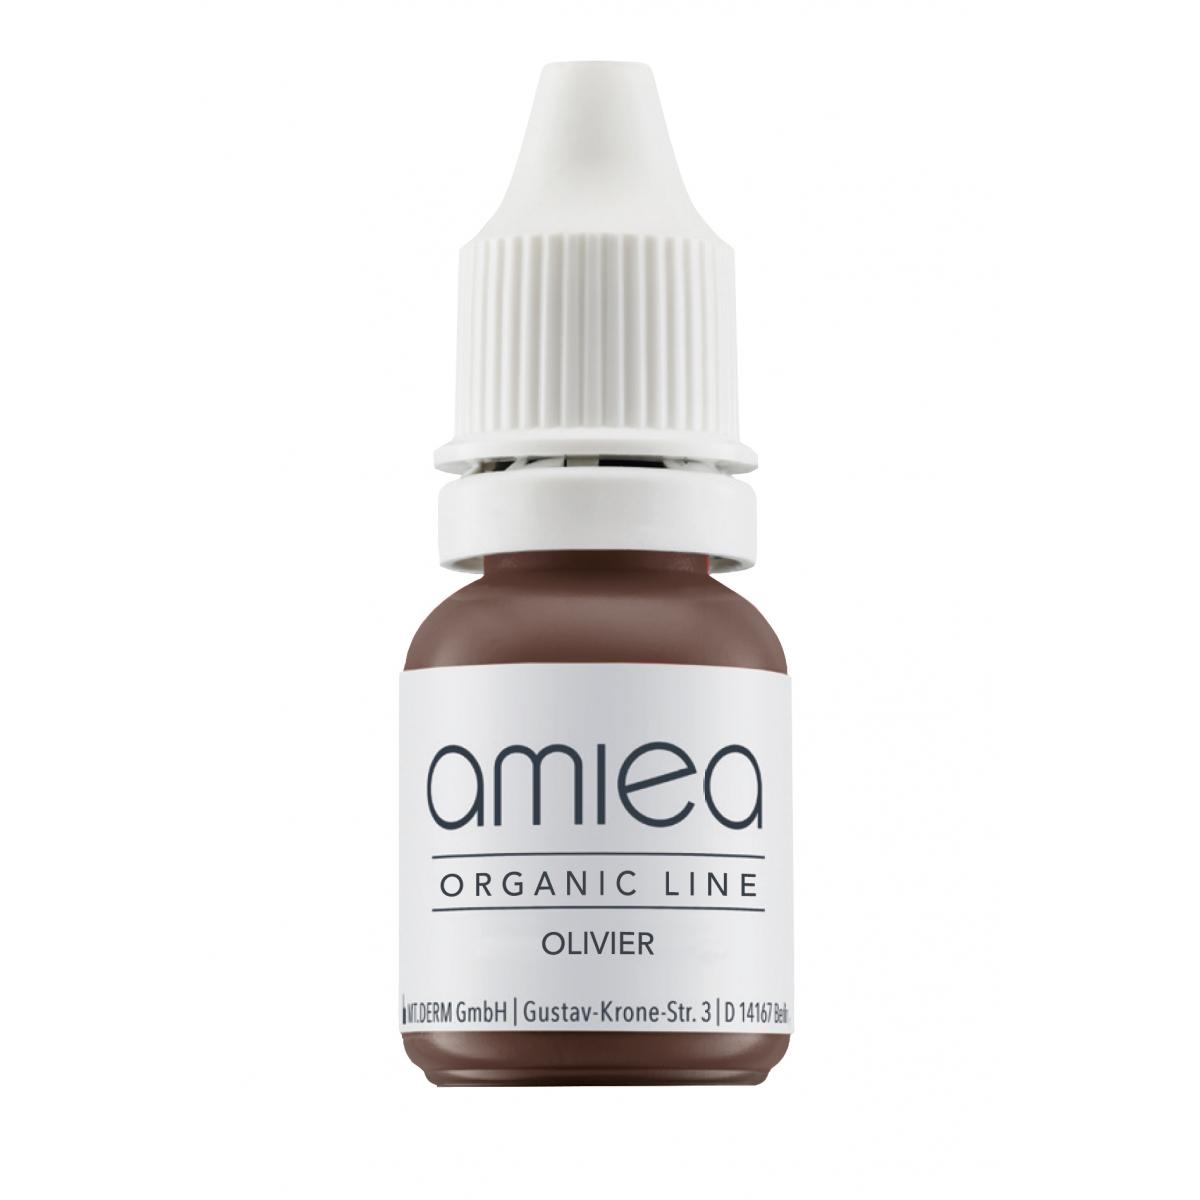 Organicline (10 ml) - PIGMENTS AMIEA ORGANICLINE OLIVIER, Flacon 10 ml